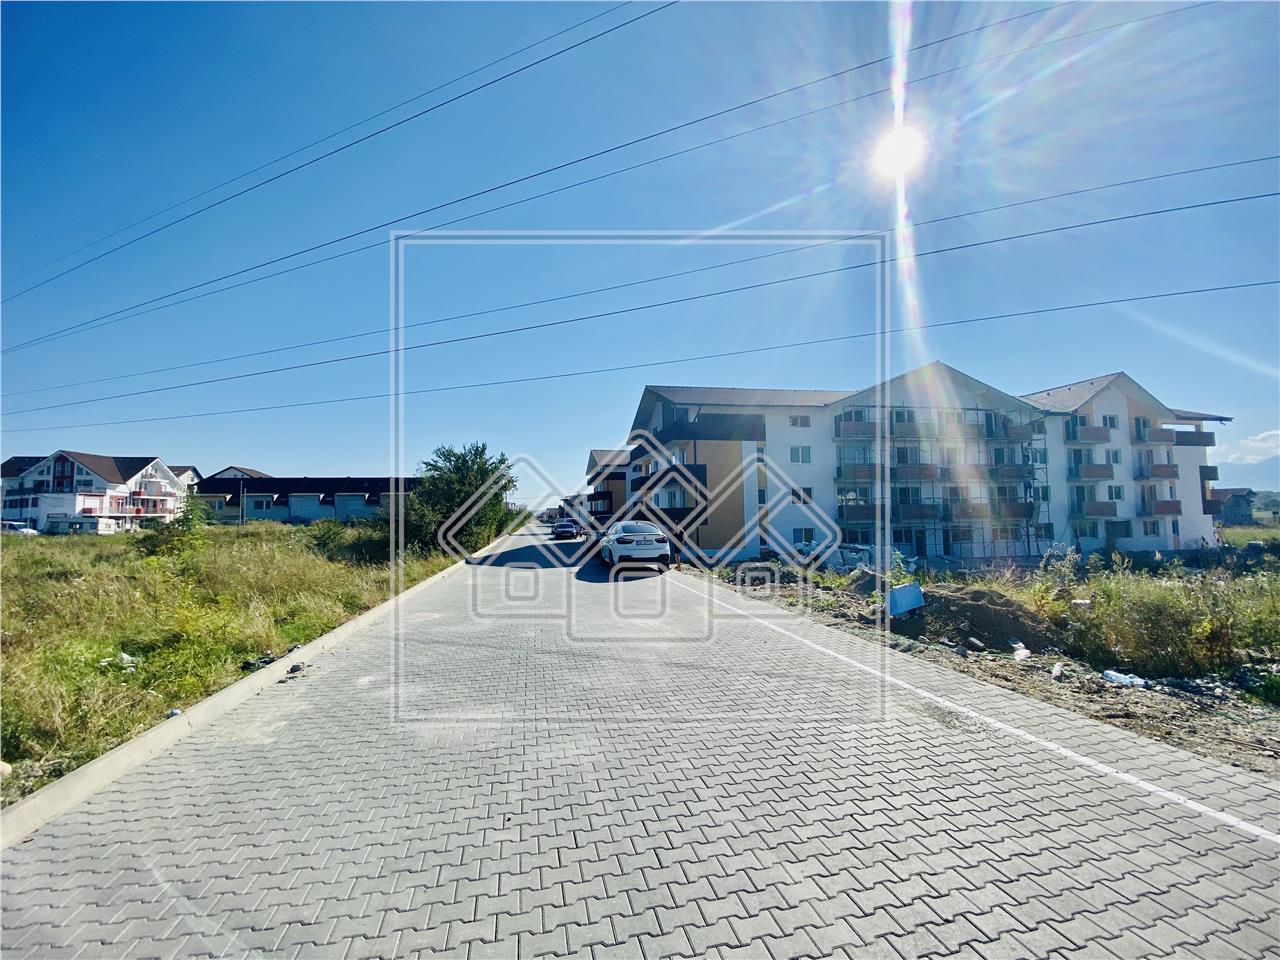 Apartament de vanzare in Sibiu - 3 camere si 2 bai - imobil nou